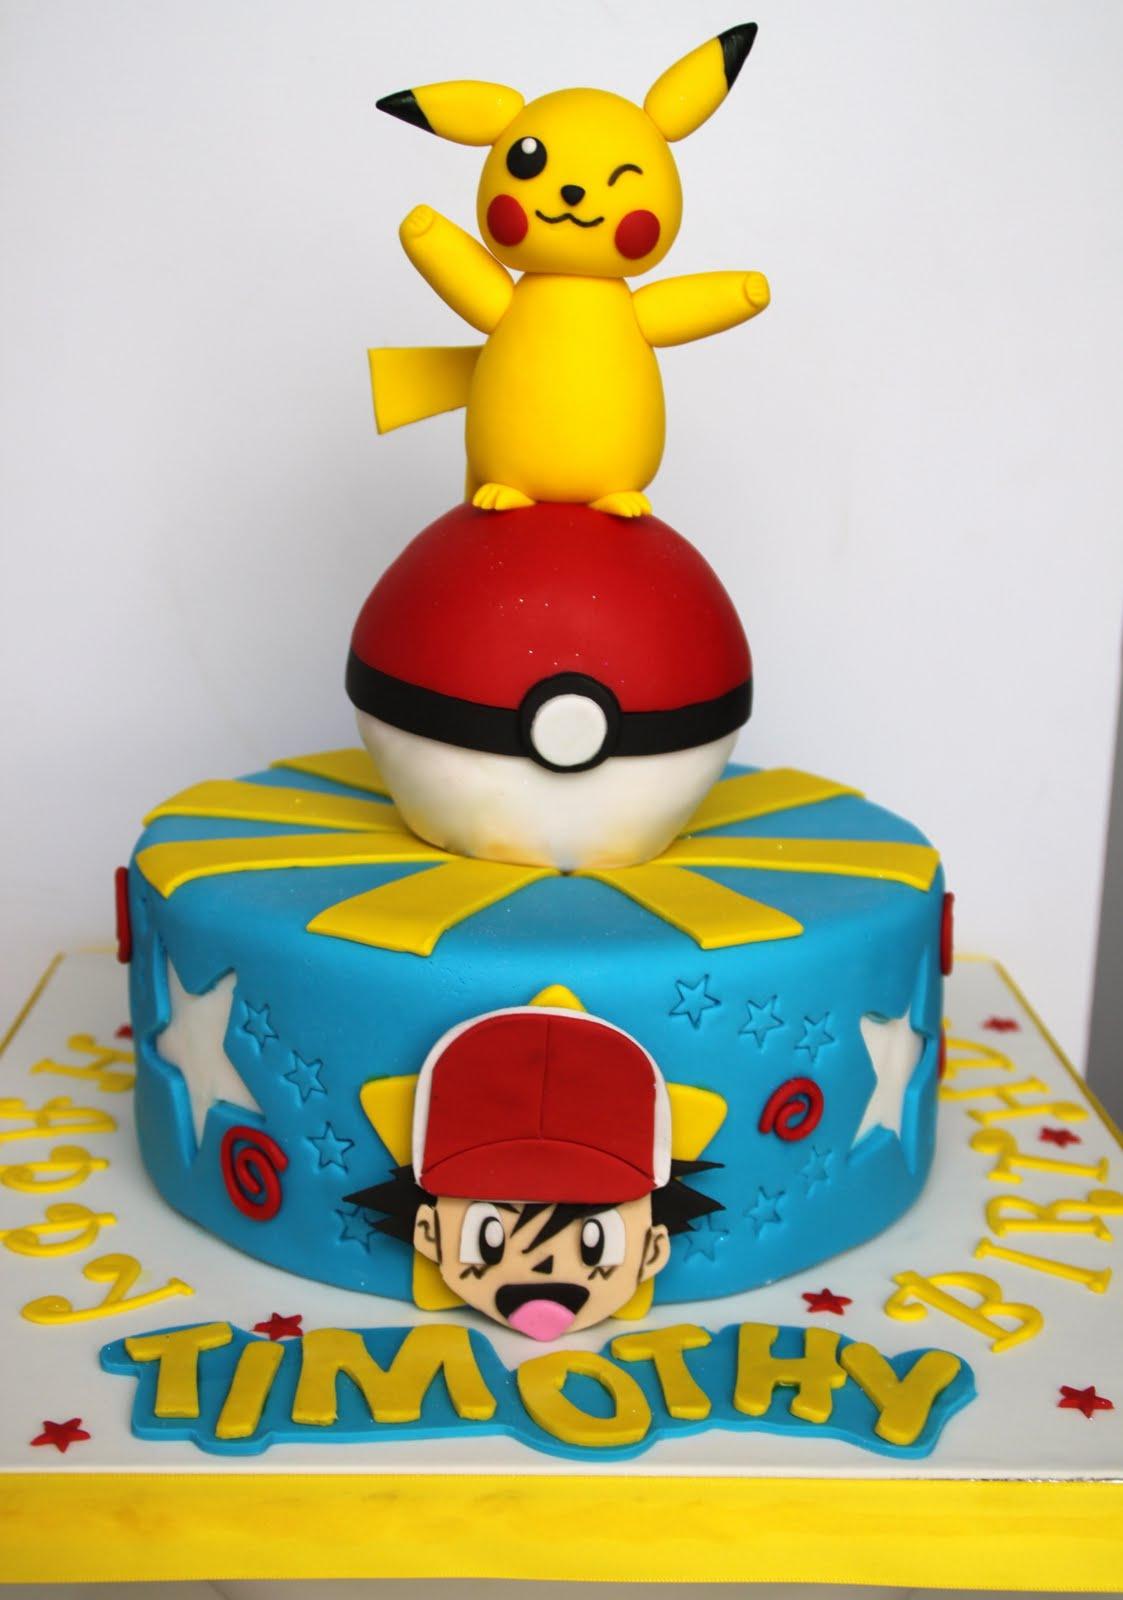 Pleasing Pikachu Cakes Decoration Ideas Little Birthday Cakes Funny Birthday Cards Online Hetedamsfinfo